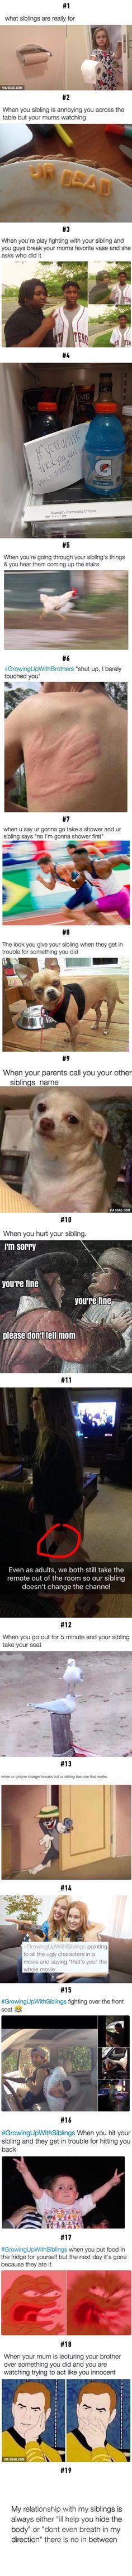 19 Perks Of Having A Sibling